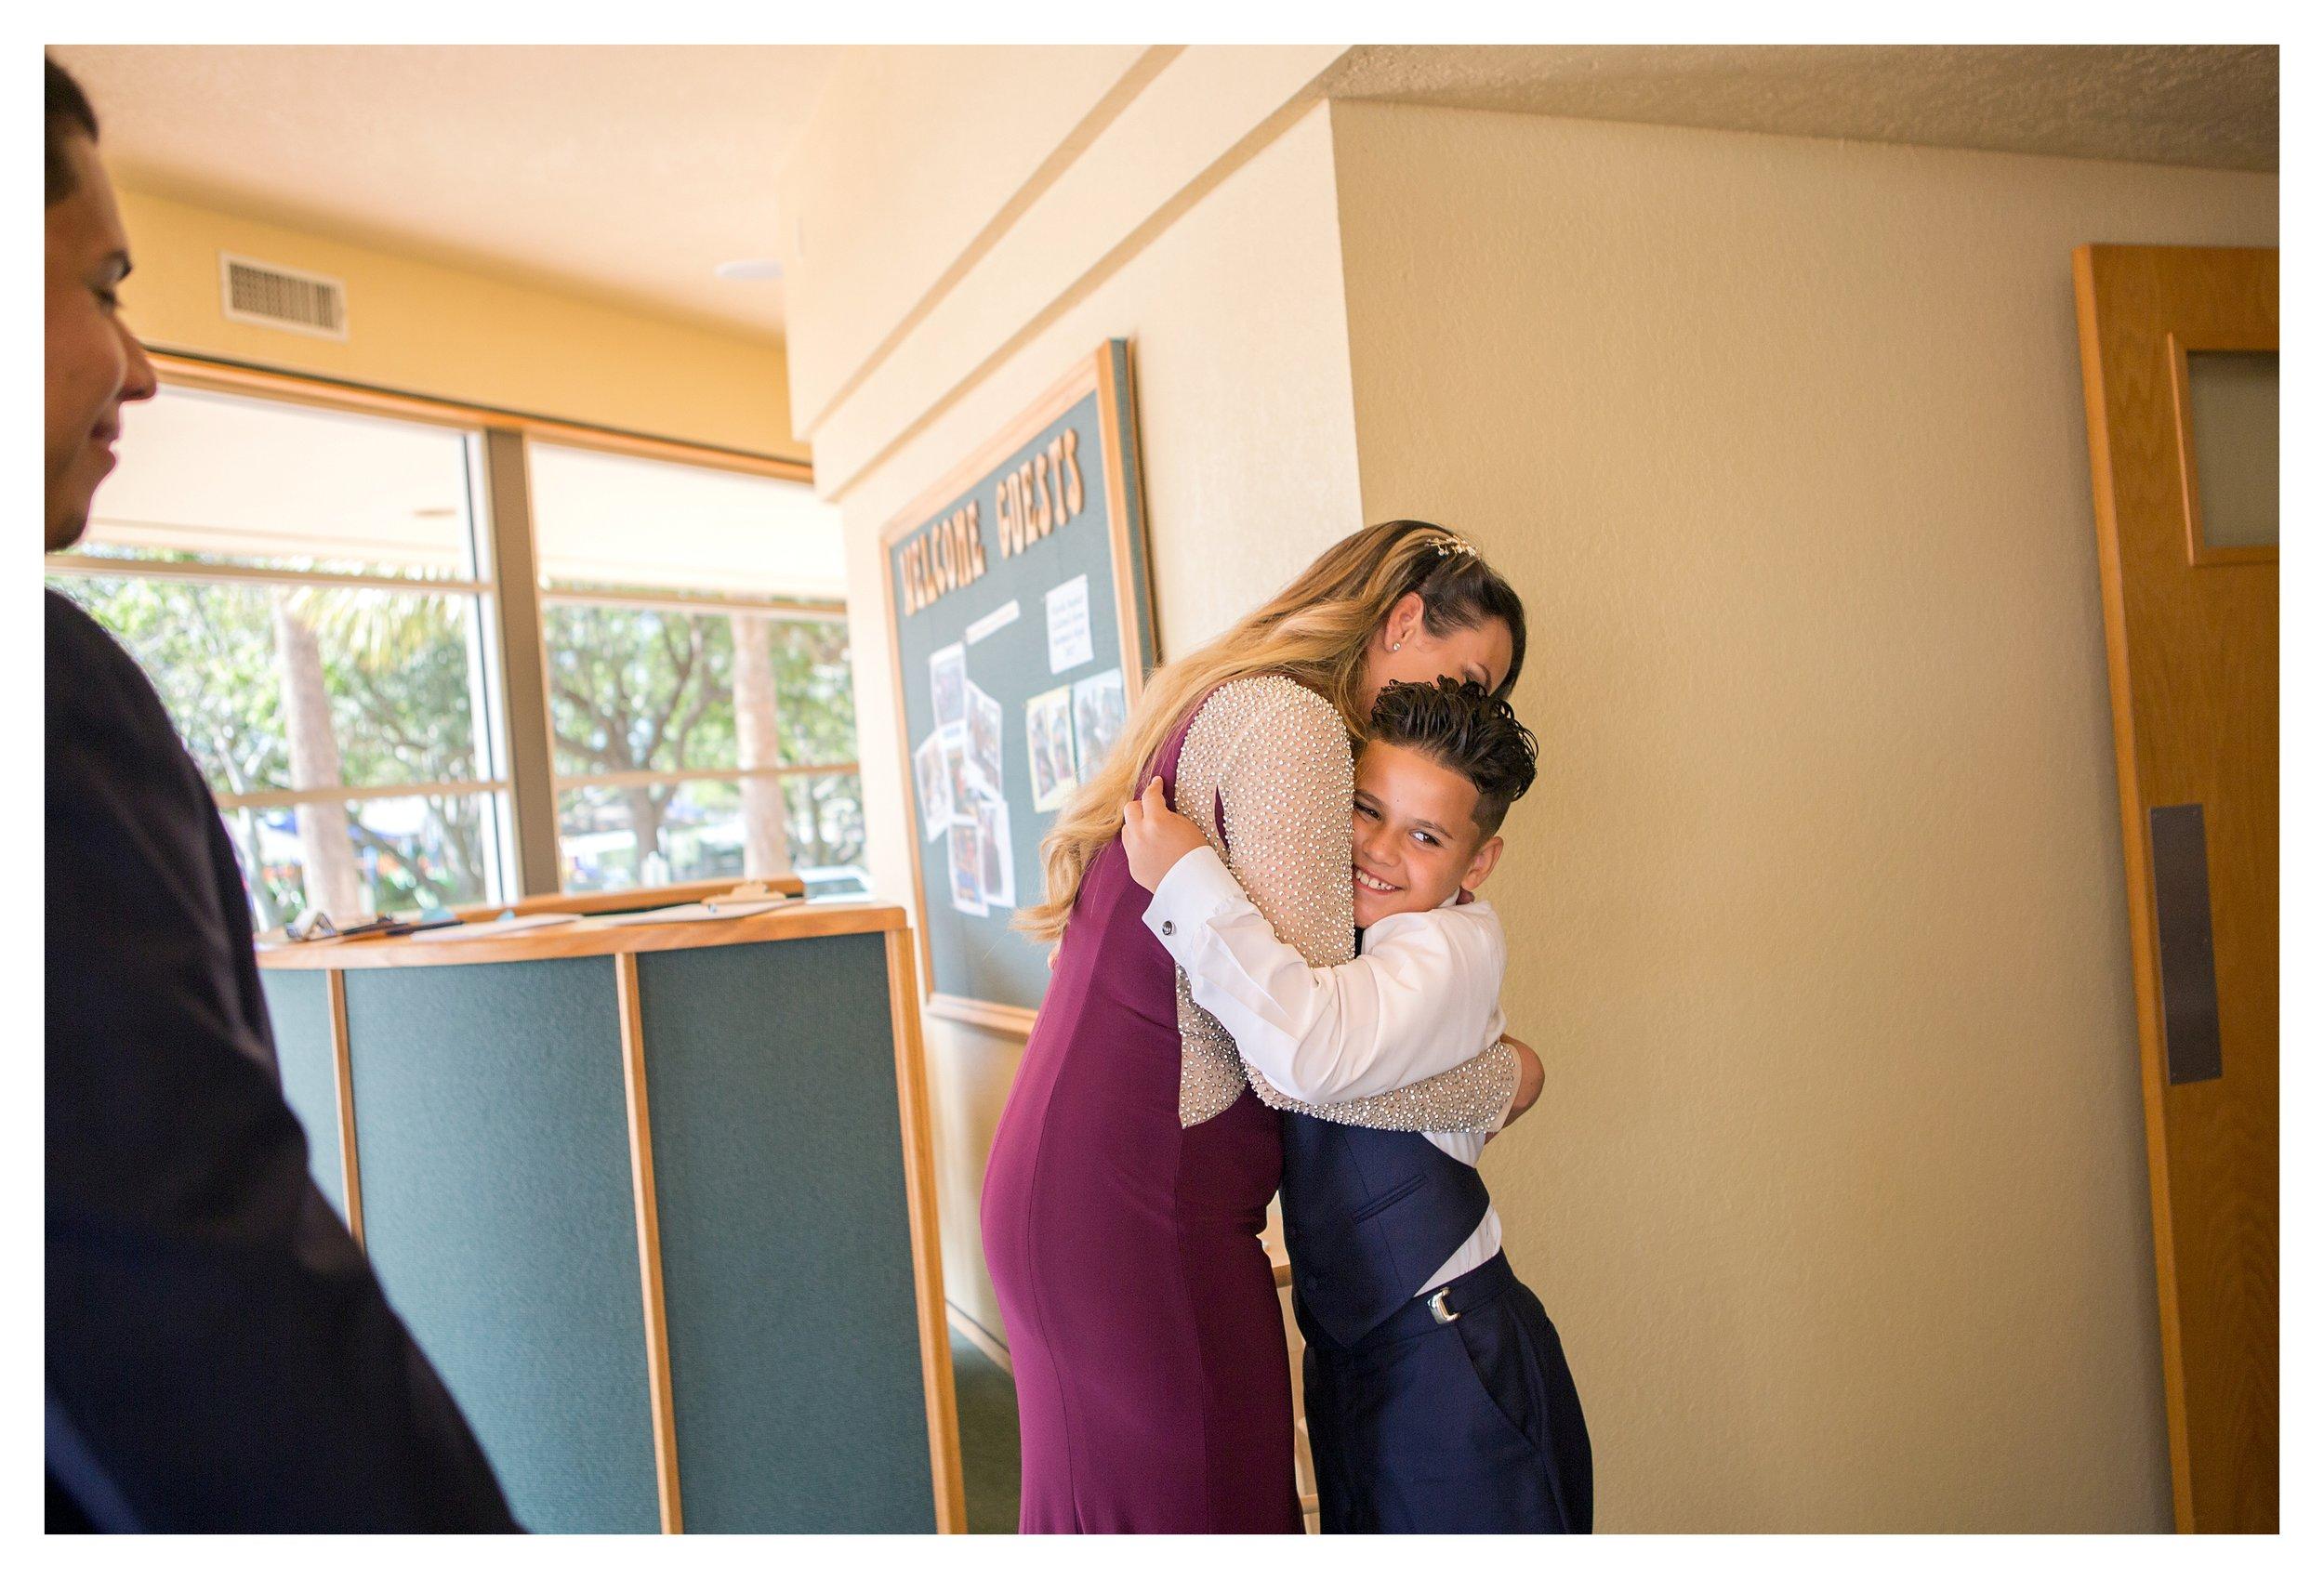 111117_Jenna and Berto's Vow Renewal_Blog_037.JPG